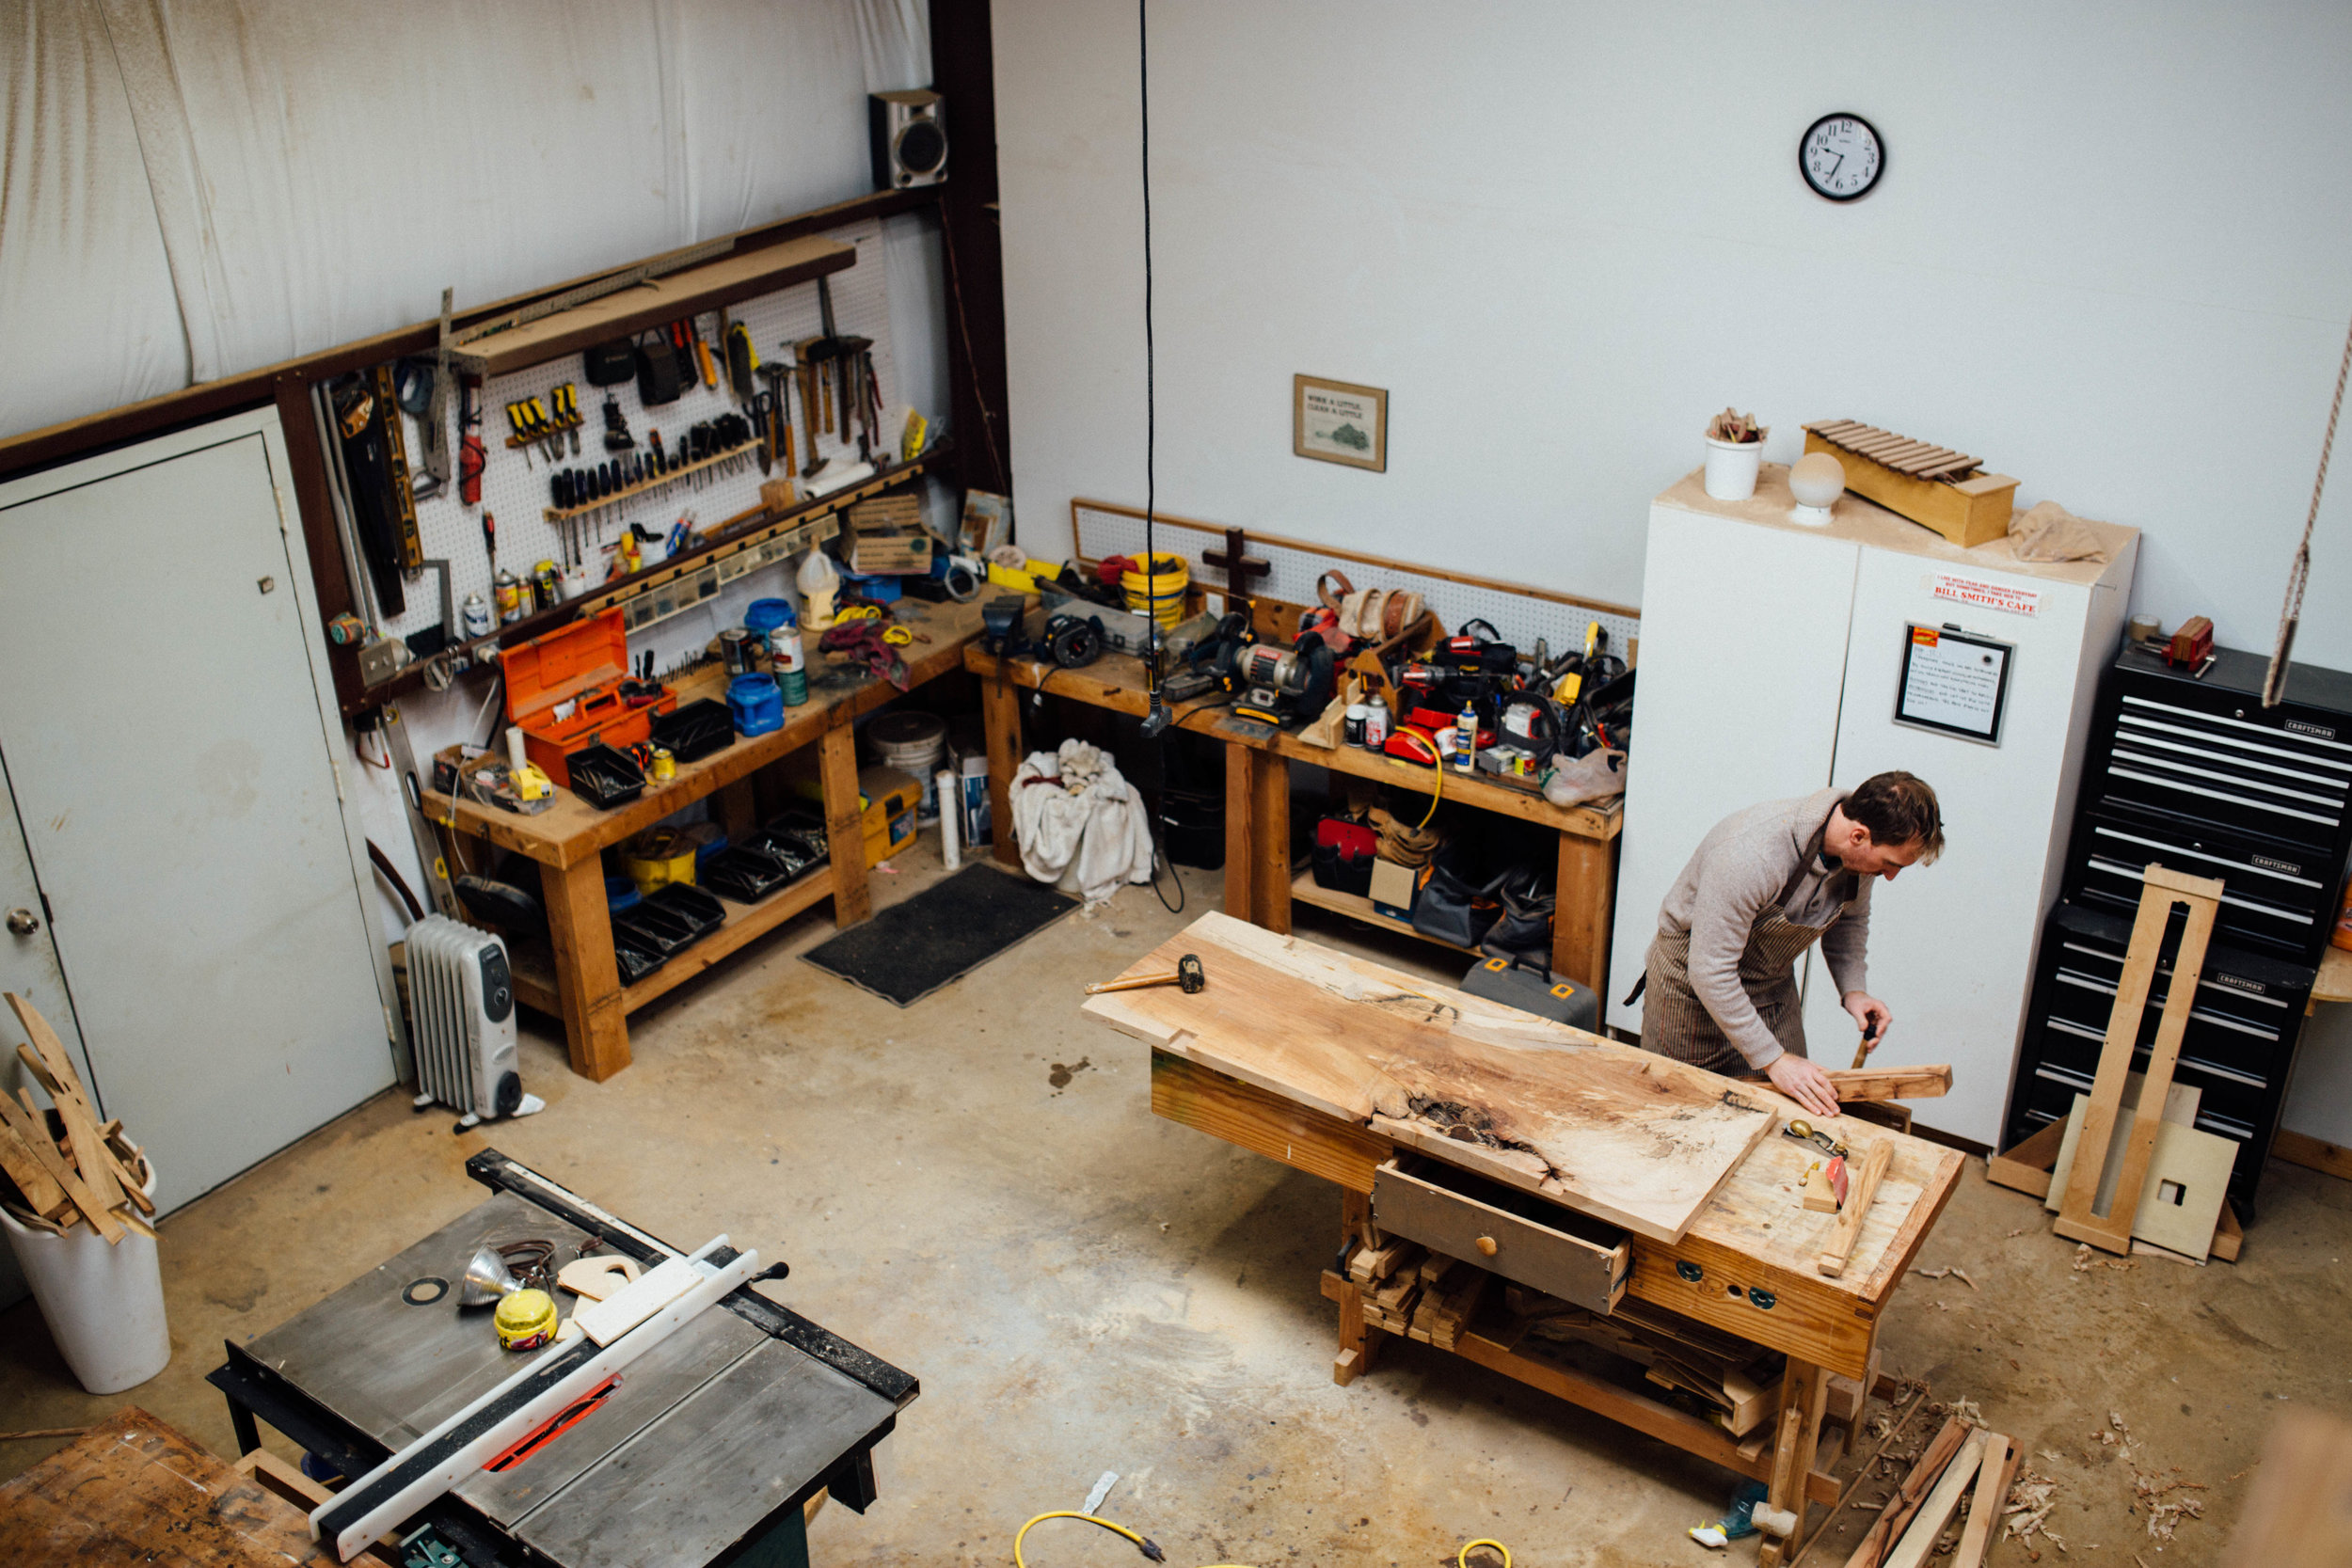 Daniel's studio